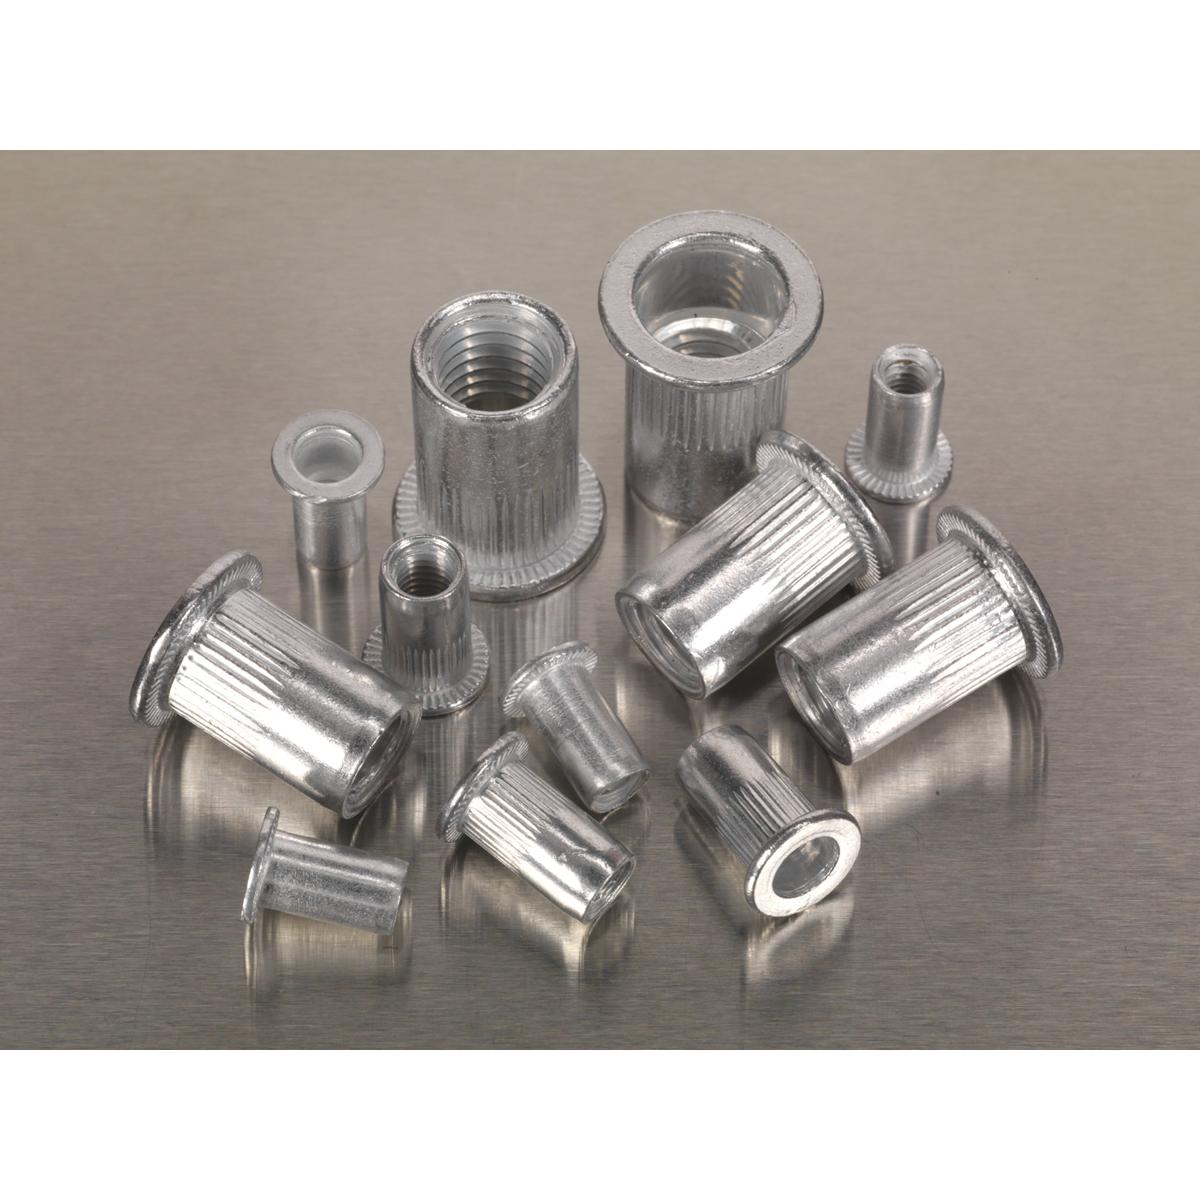 4x NGK Spark Plugs for SUZUKI 650cc DL650A V-Strom XP 2010 No.1275 Twin Spark